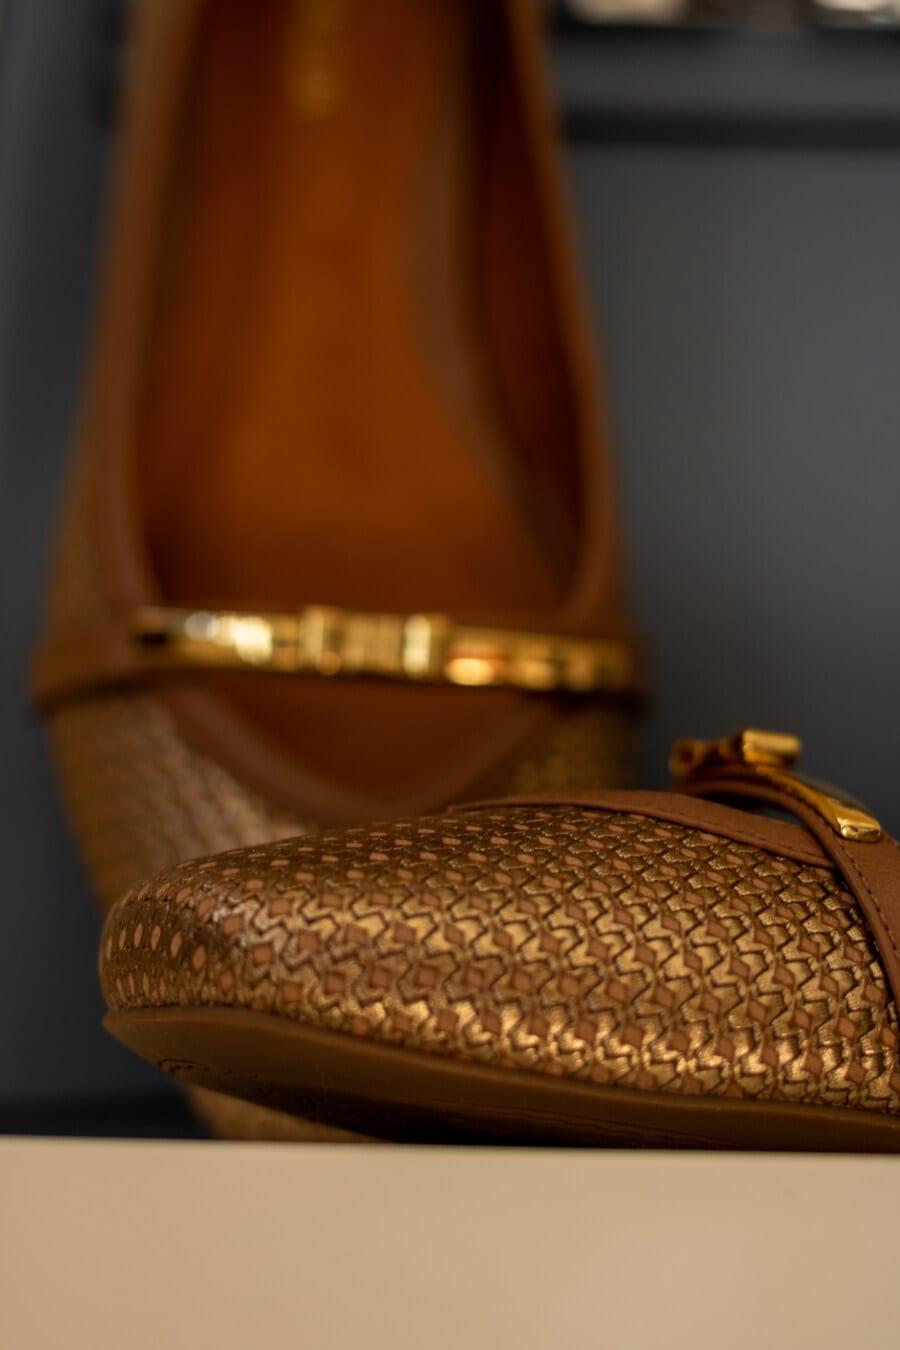 obuća, sandale, modni, smeđa, izbliza, otmeno, koža, cipela, sija, klasično